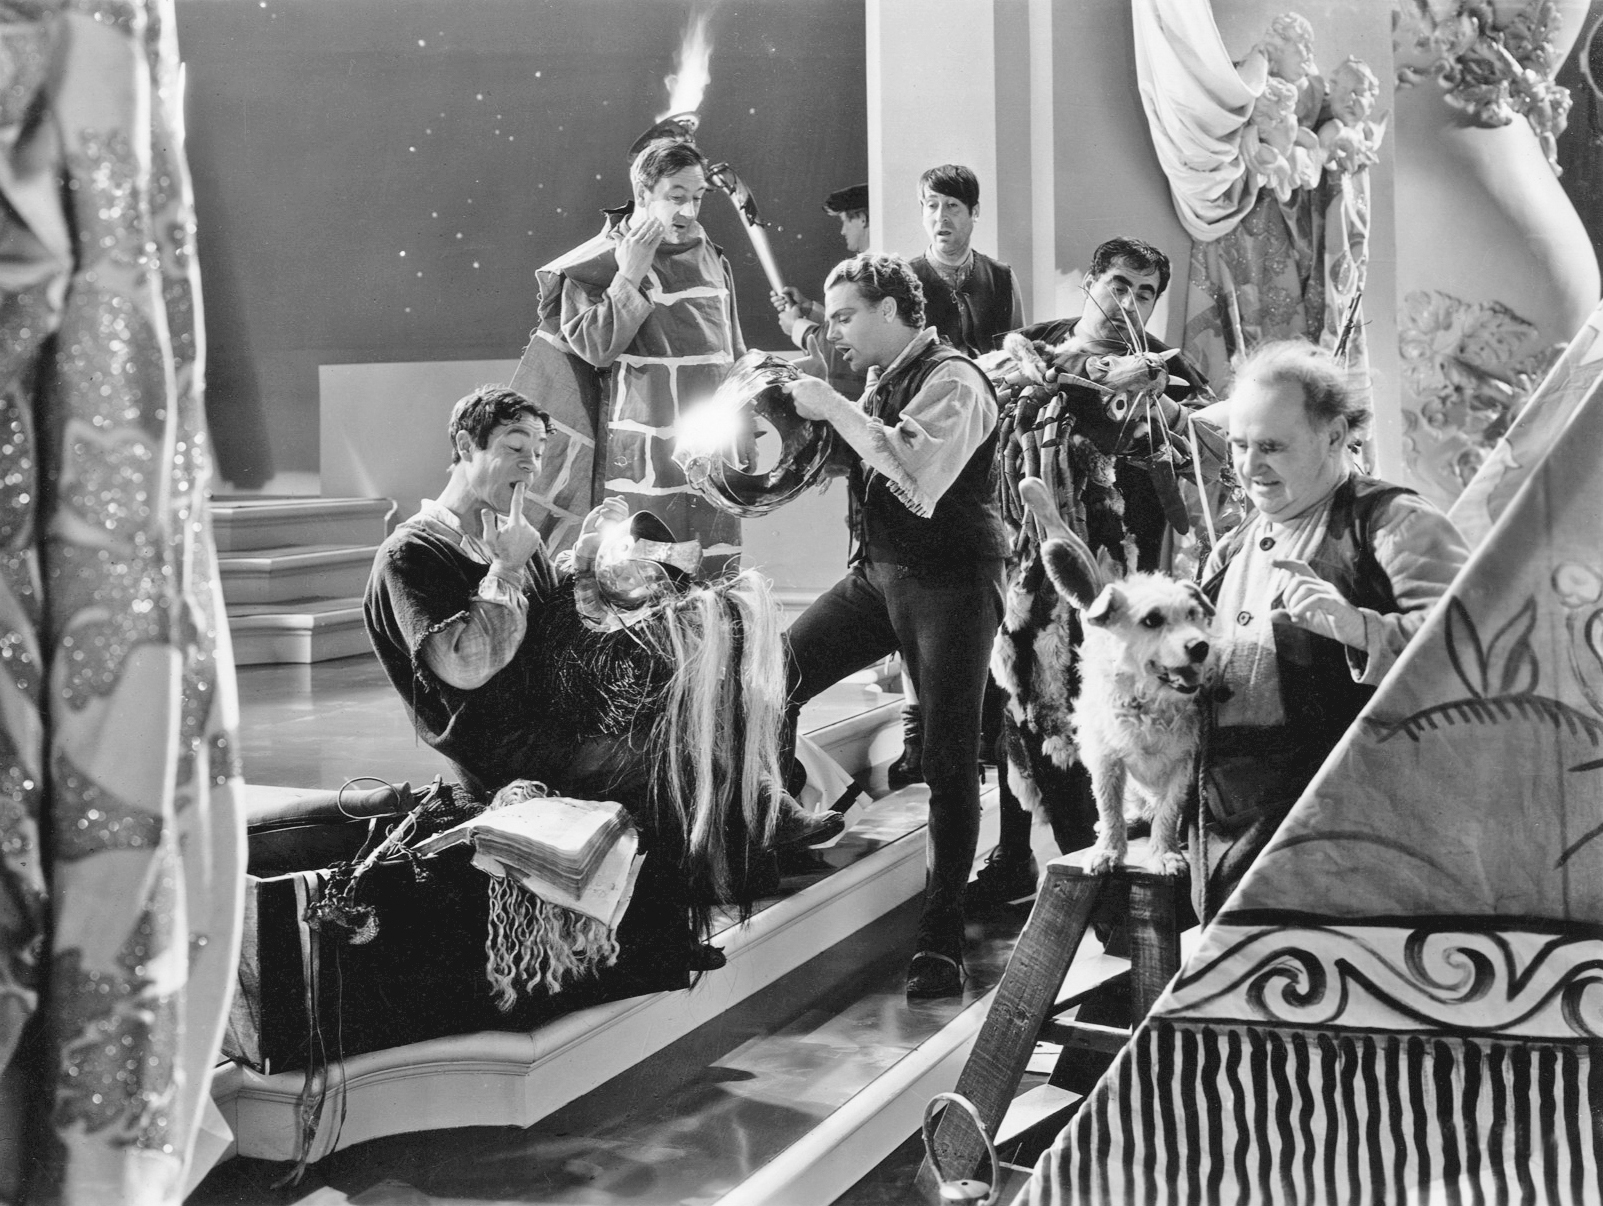 James Cagney, Hugh Herbert, Joe E. Brown, Otis Harlan, Frank McHugh, Dewey Robinson, and Arthur Treacher in A Midsummer Night's Dream (1935)